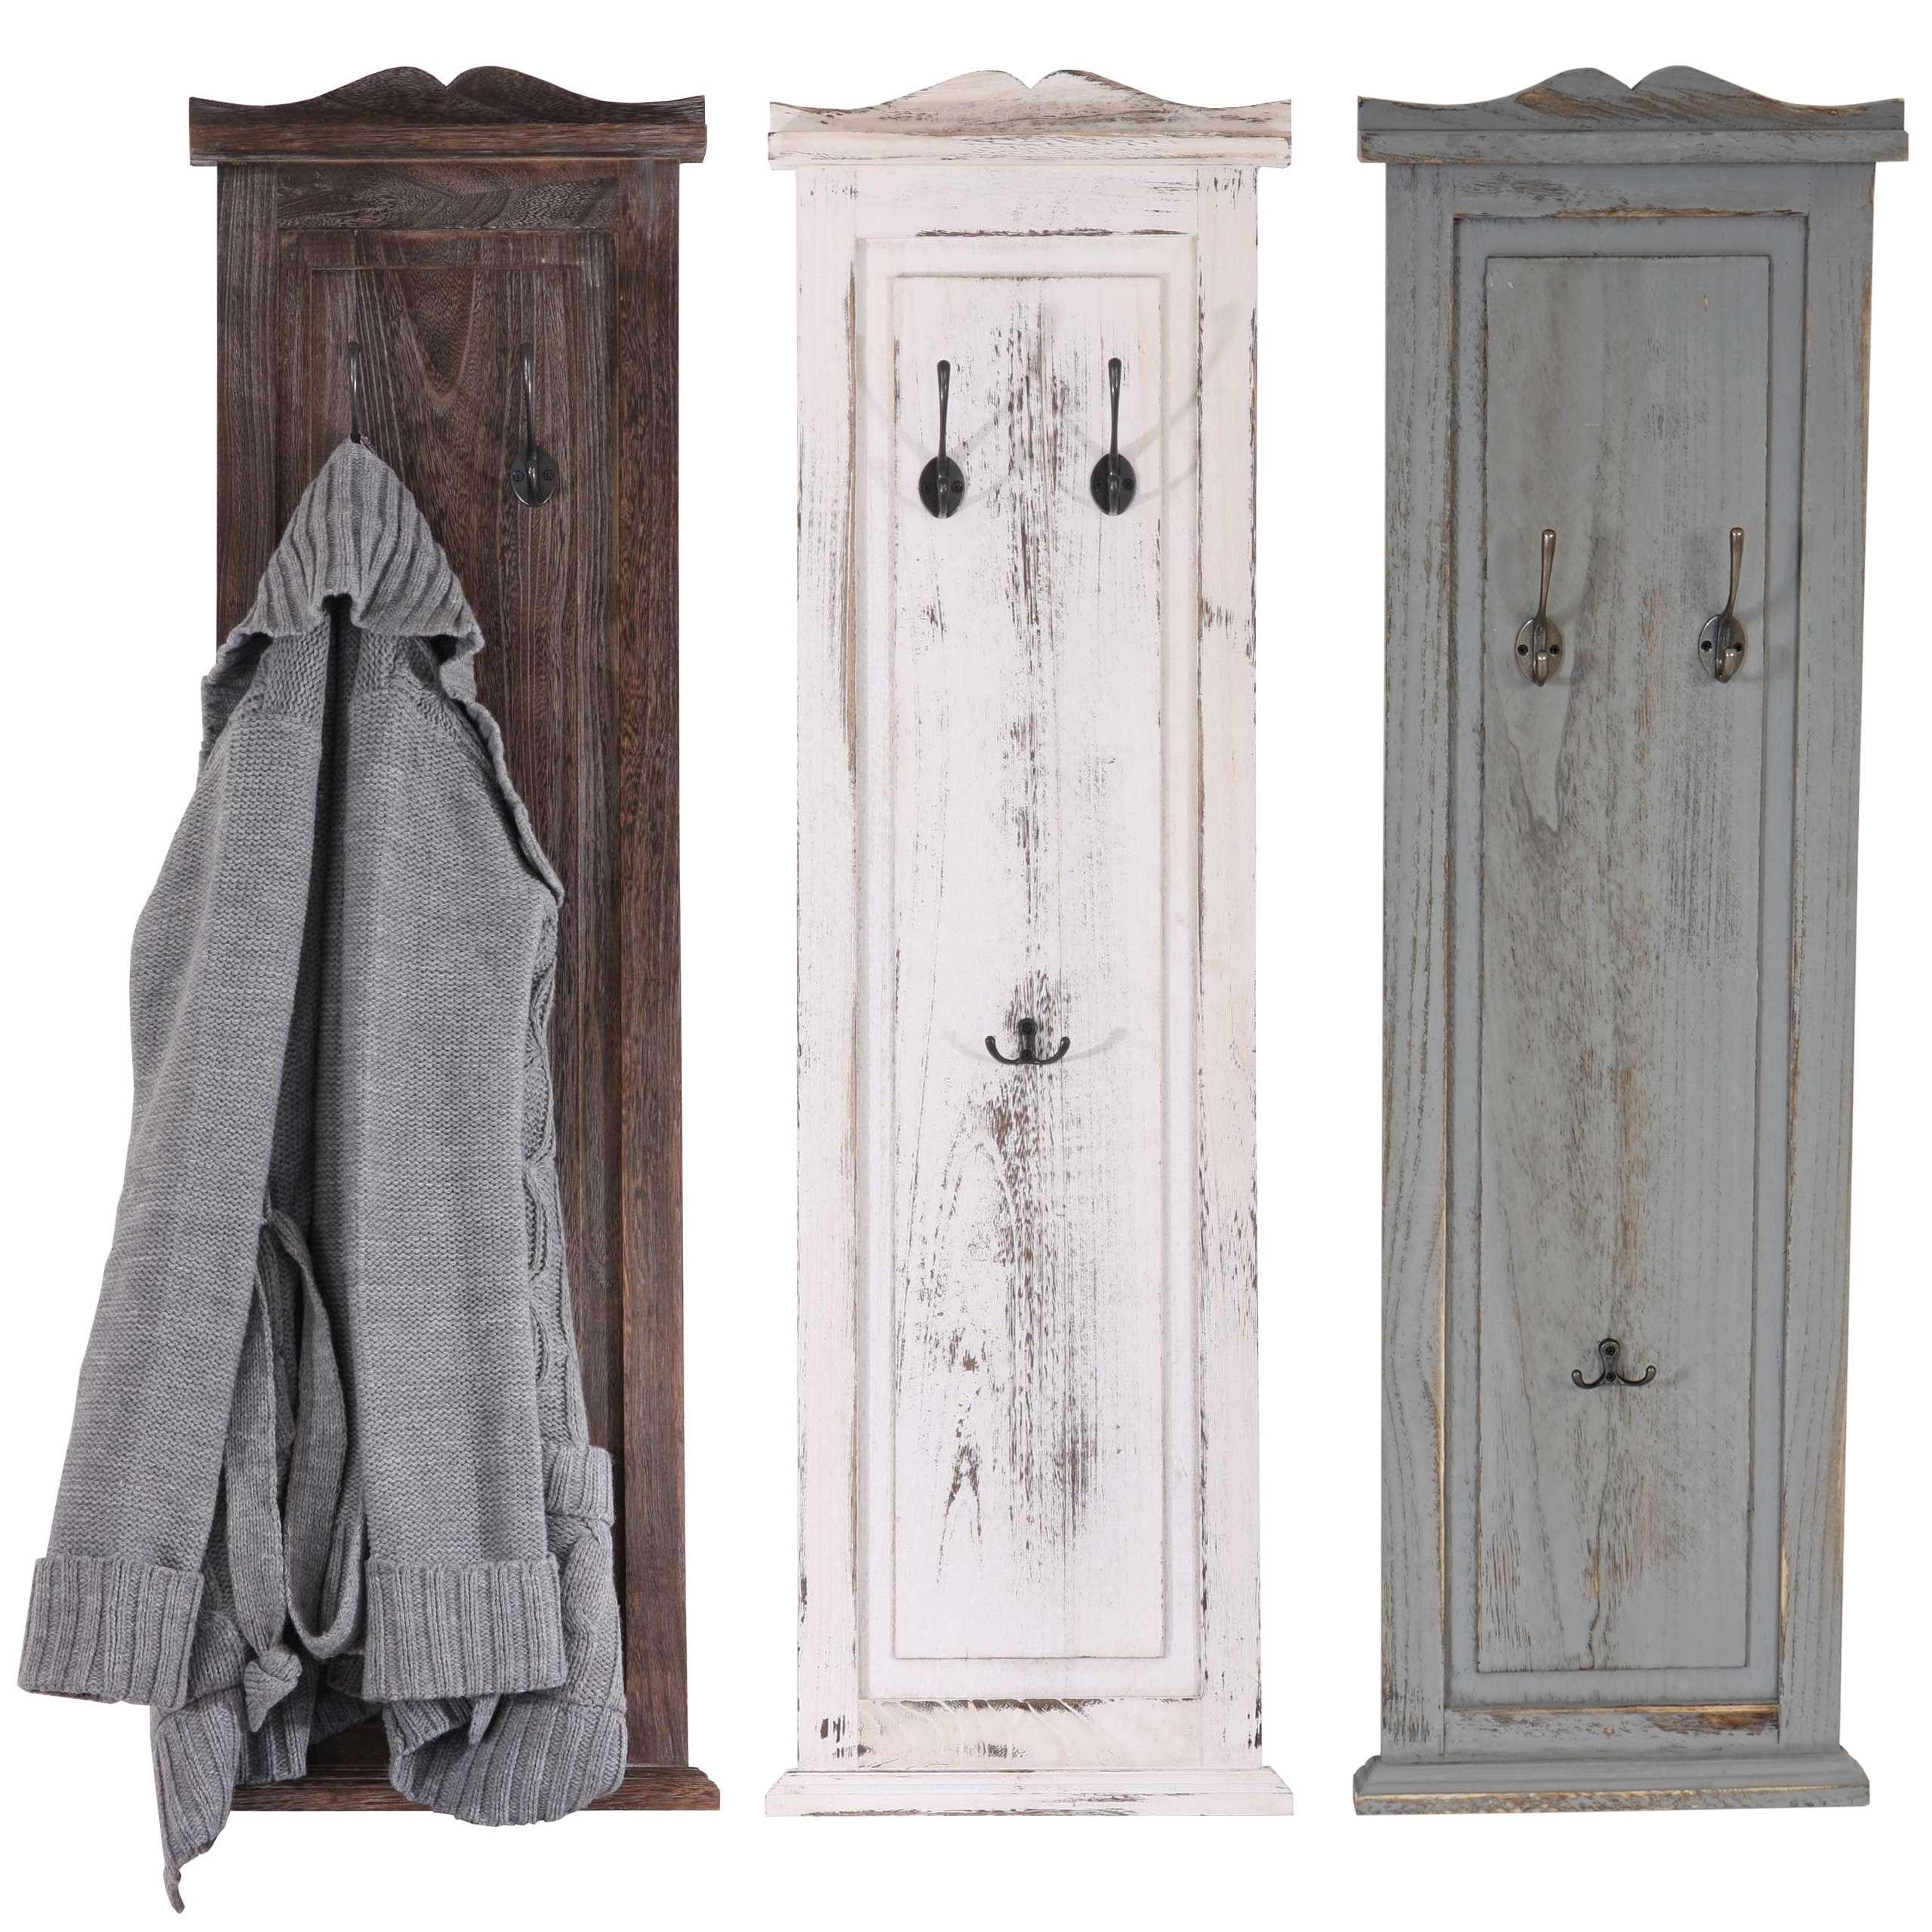 2x garderobe wandgarderobe wandhaken 109x28x3 5cm shabby look wei braun grau ebay. Black Bedroom Furniture Sets. Home Design Ideas